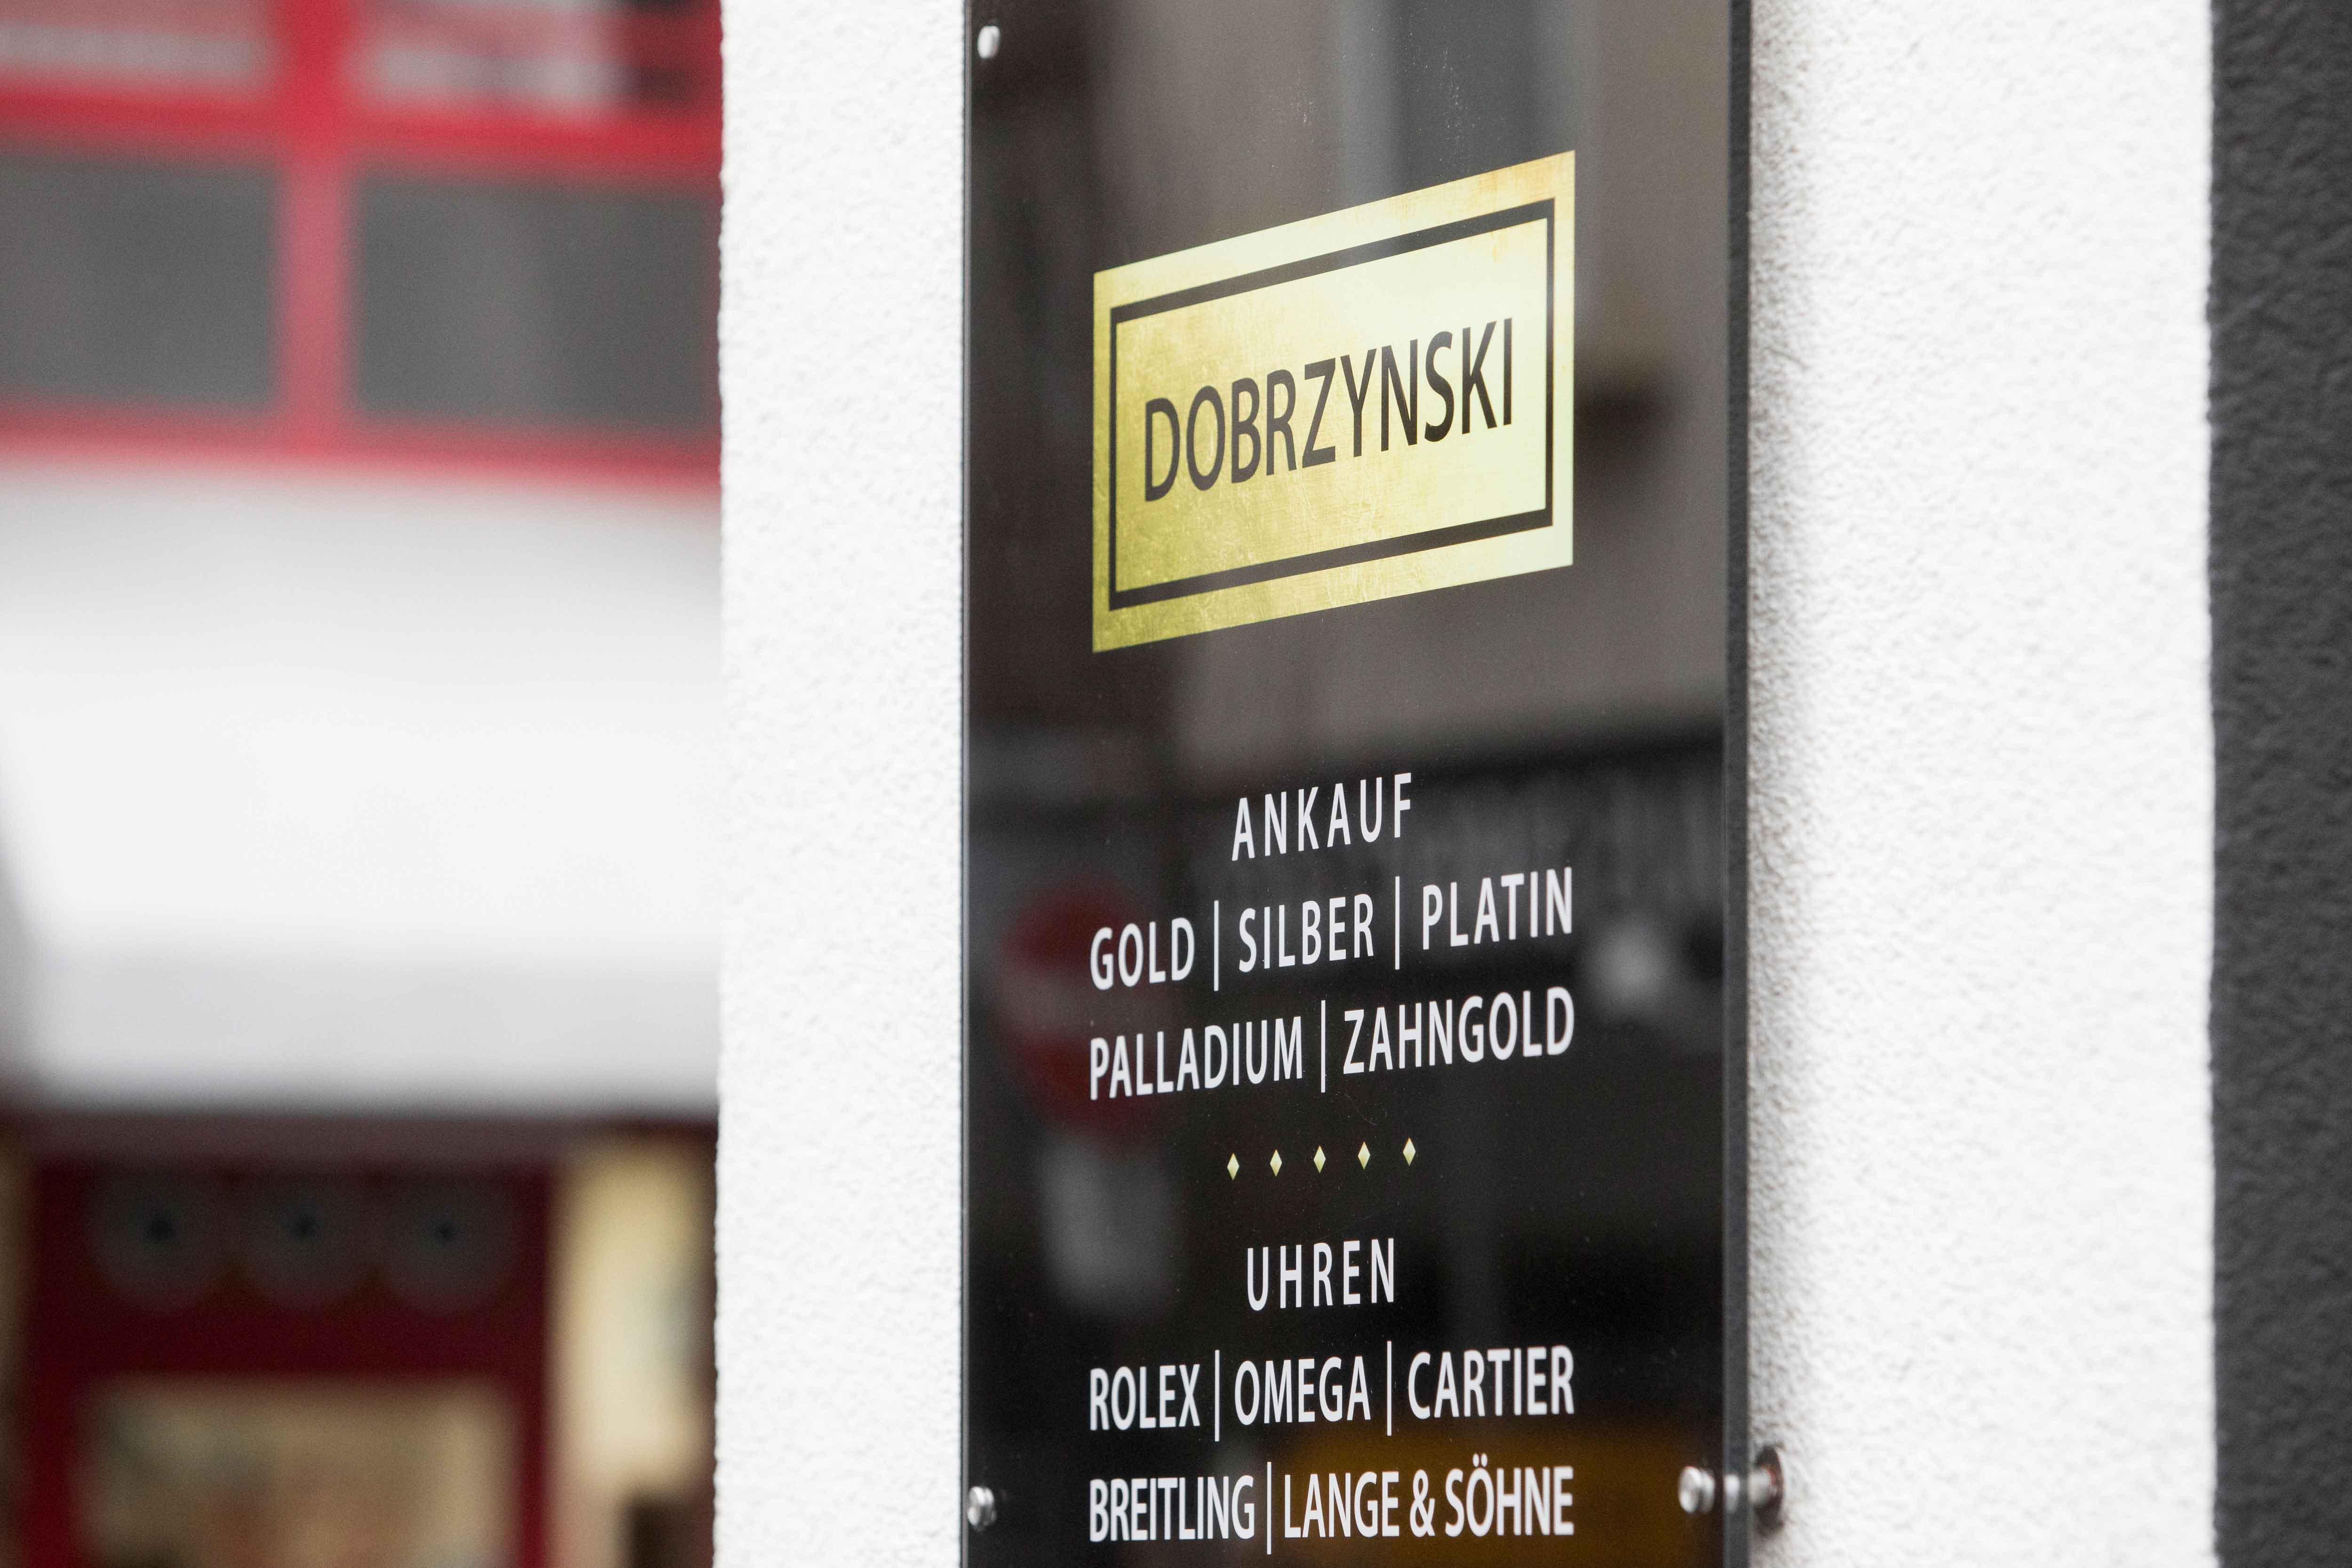 Dobrzynski Leihhaus Mannheim Goldankauf